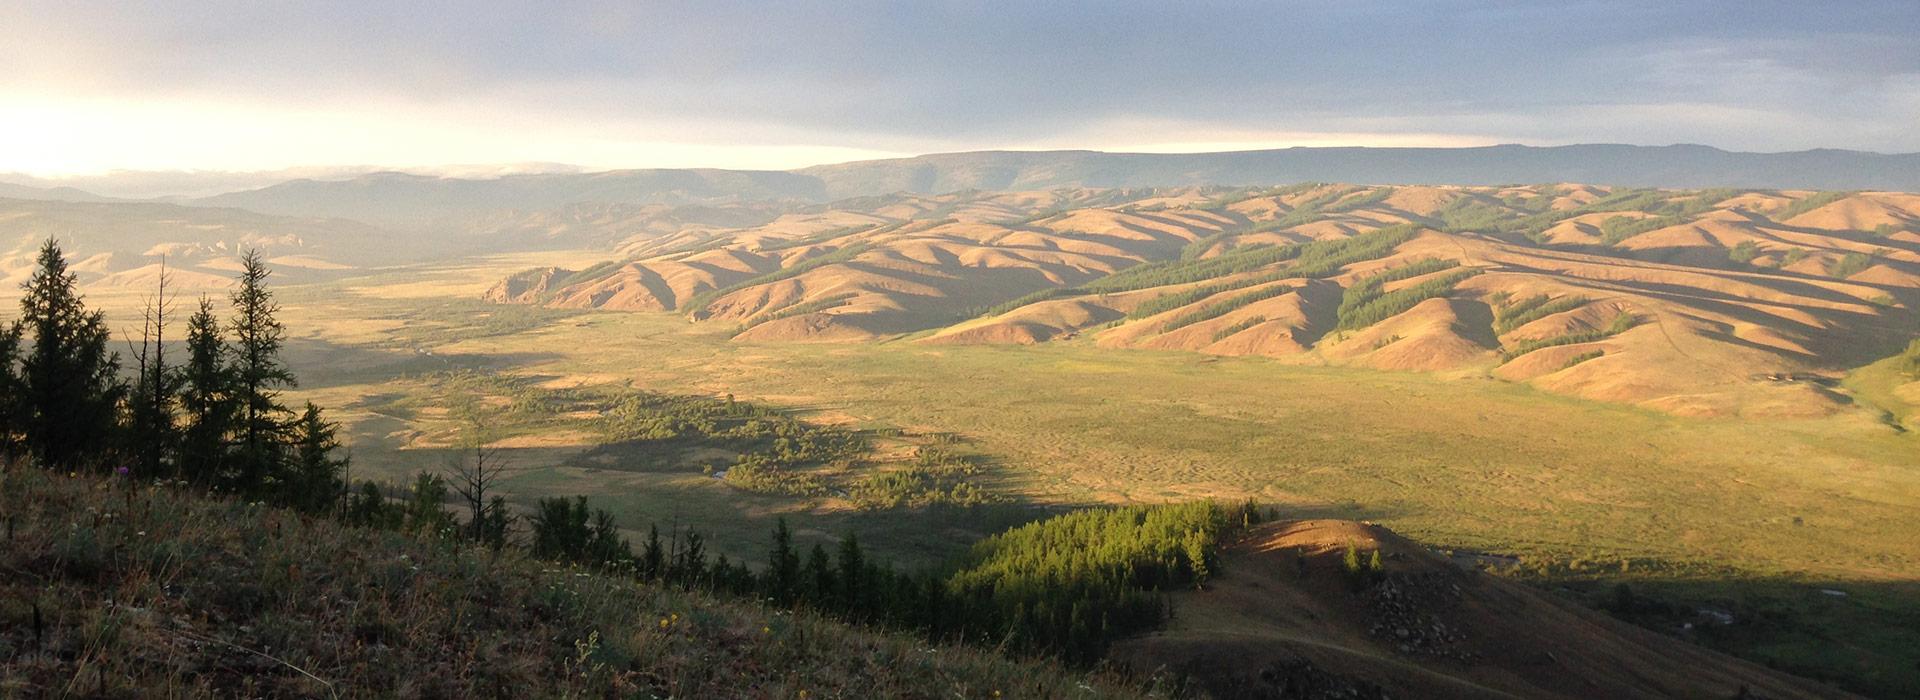 Khangai Mountains National Park